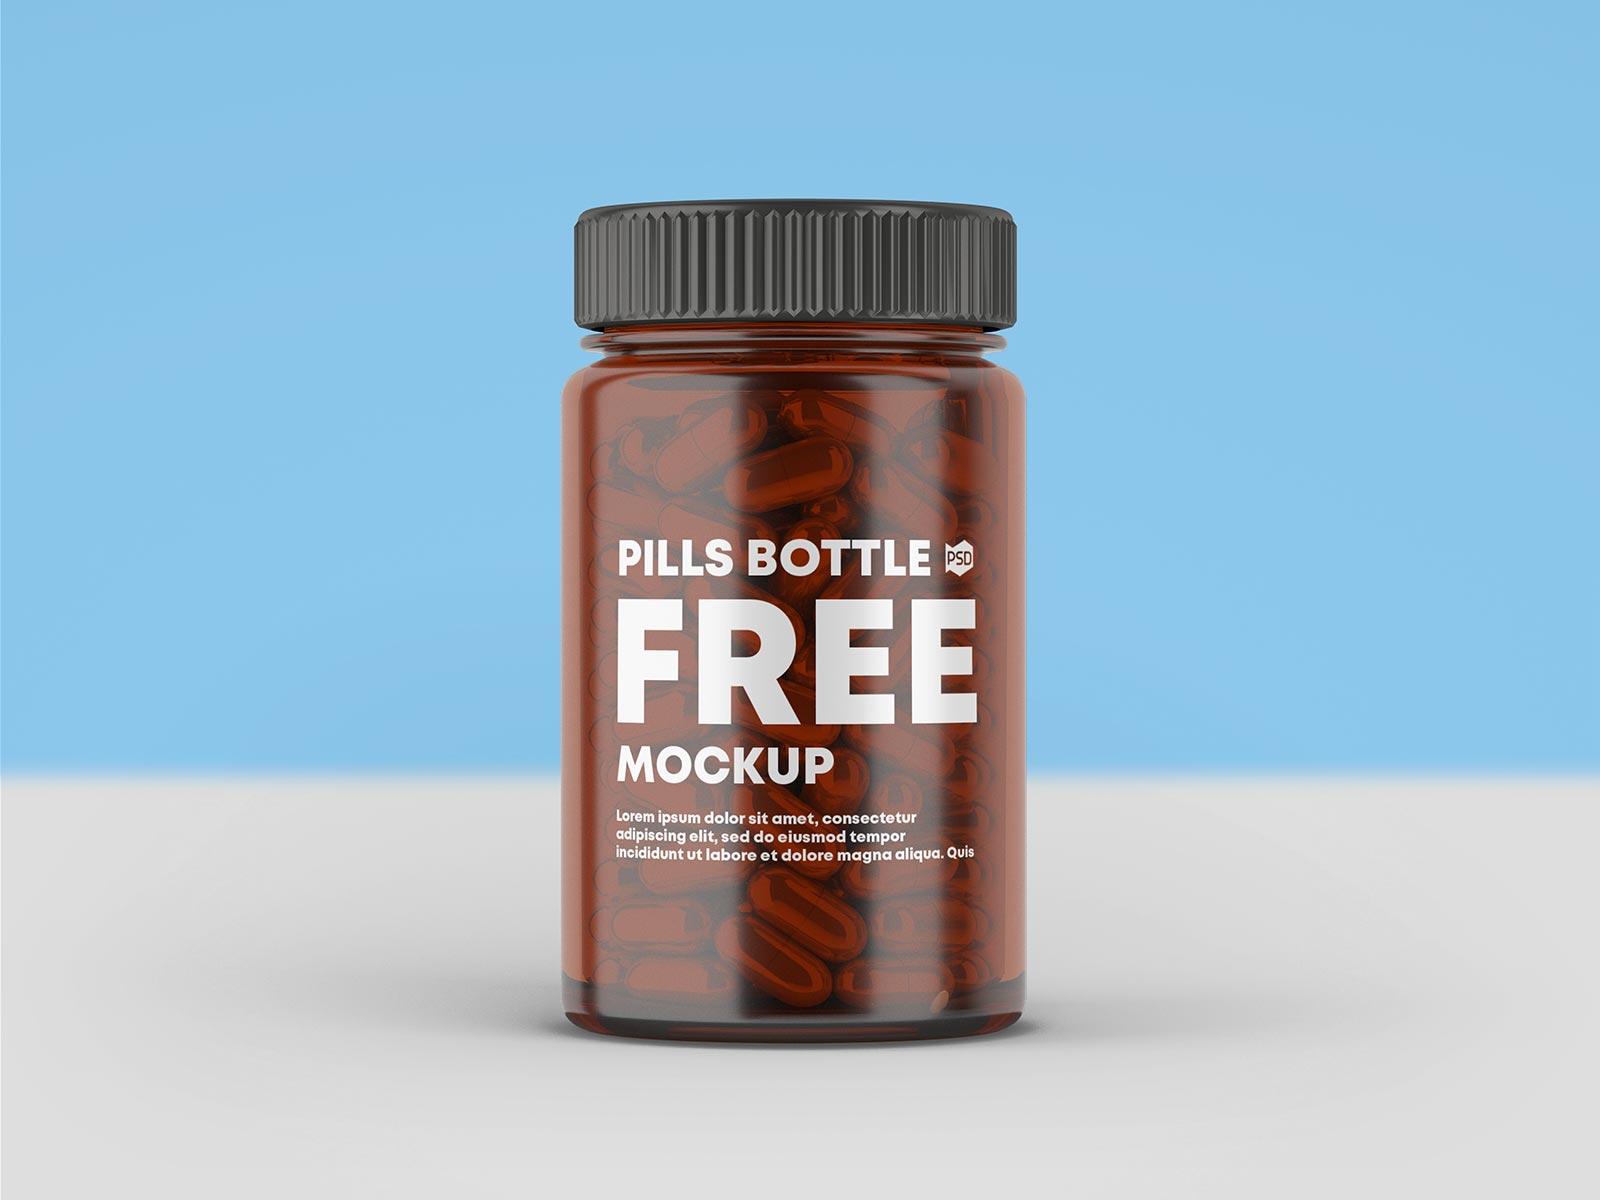 Free Amber Glass Capsule Pill Bottle Mockup PSD Set (1)